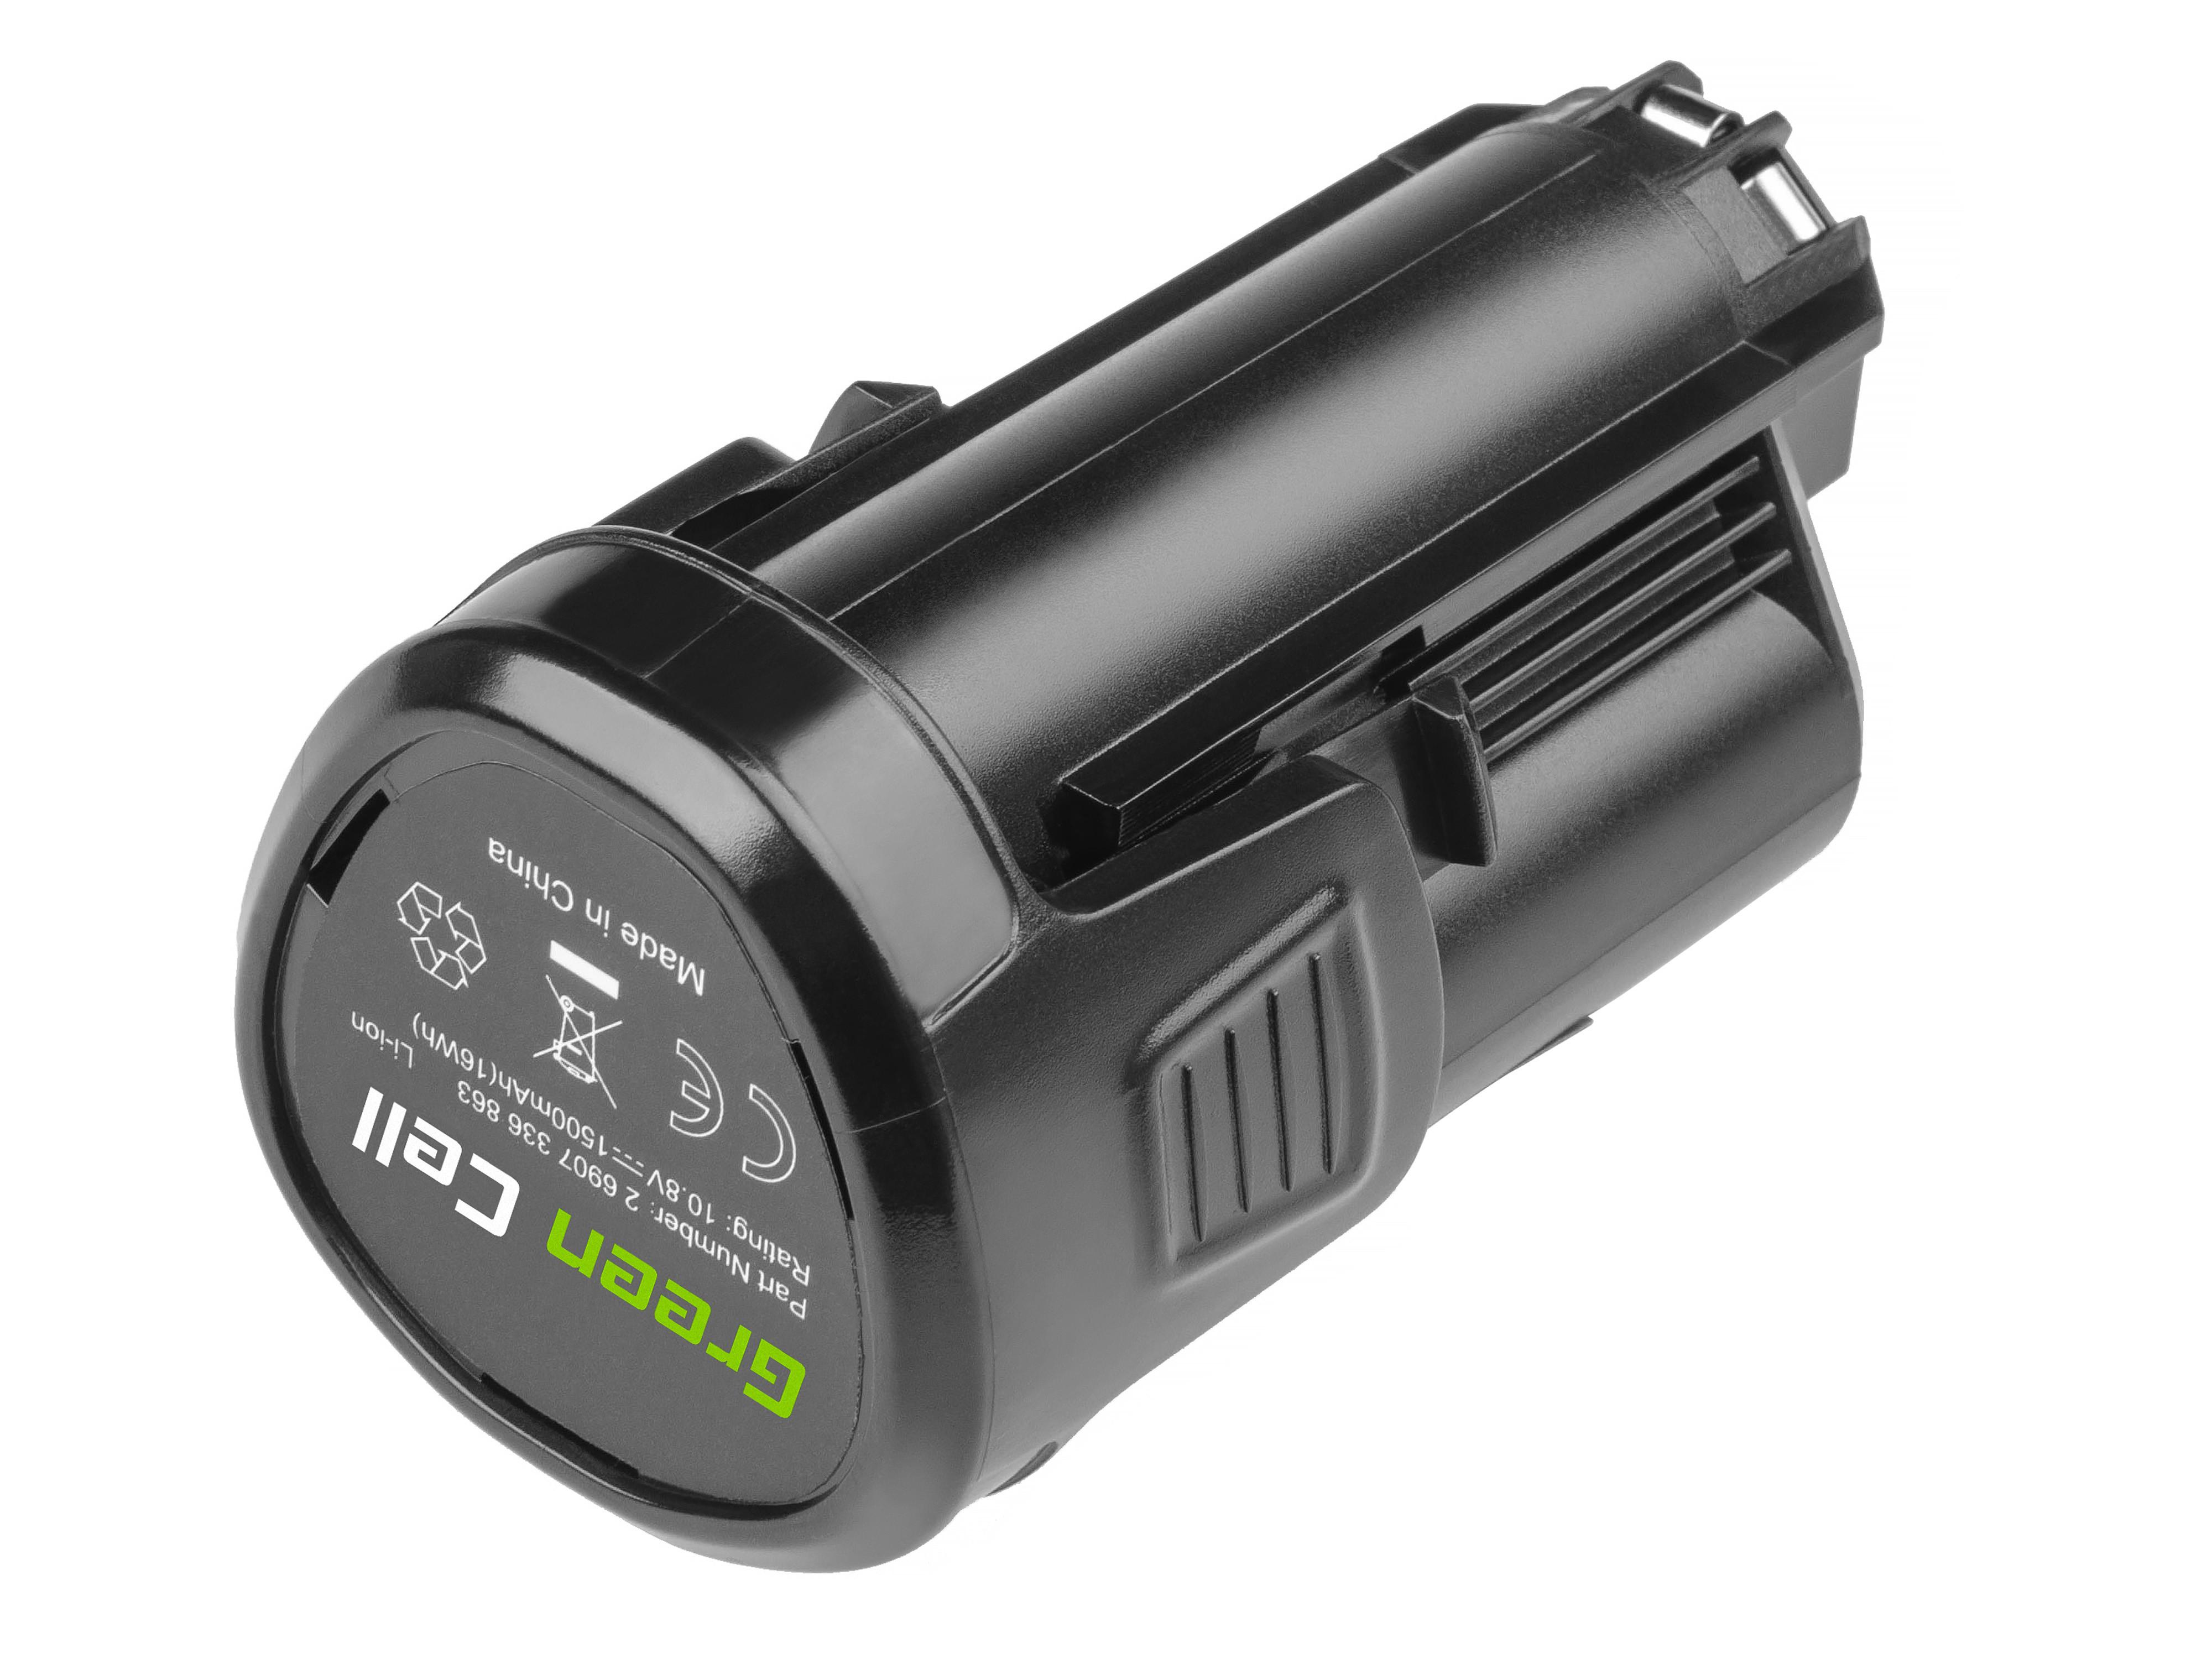 Green Cell Baterie Bosch PMF PSM PSR 10,8 LI-2 10.8V 1.5Ah